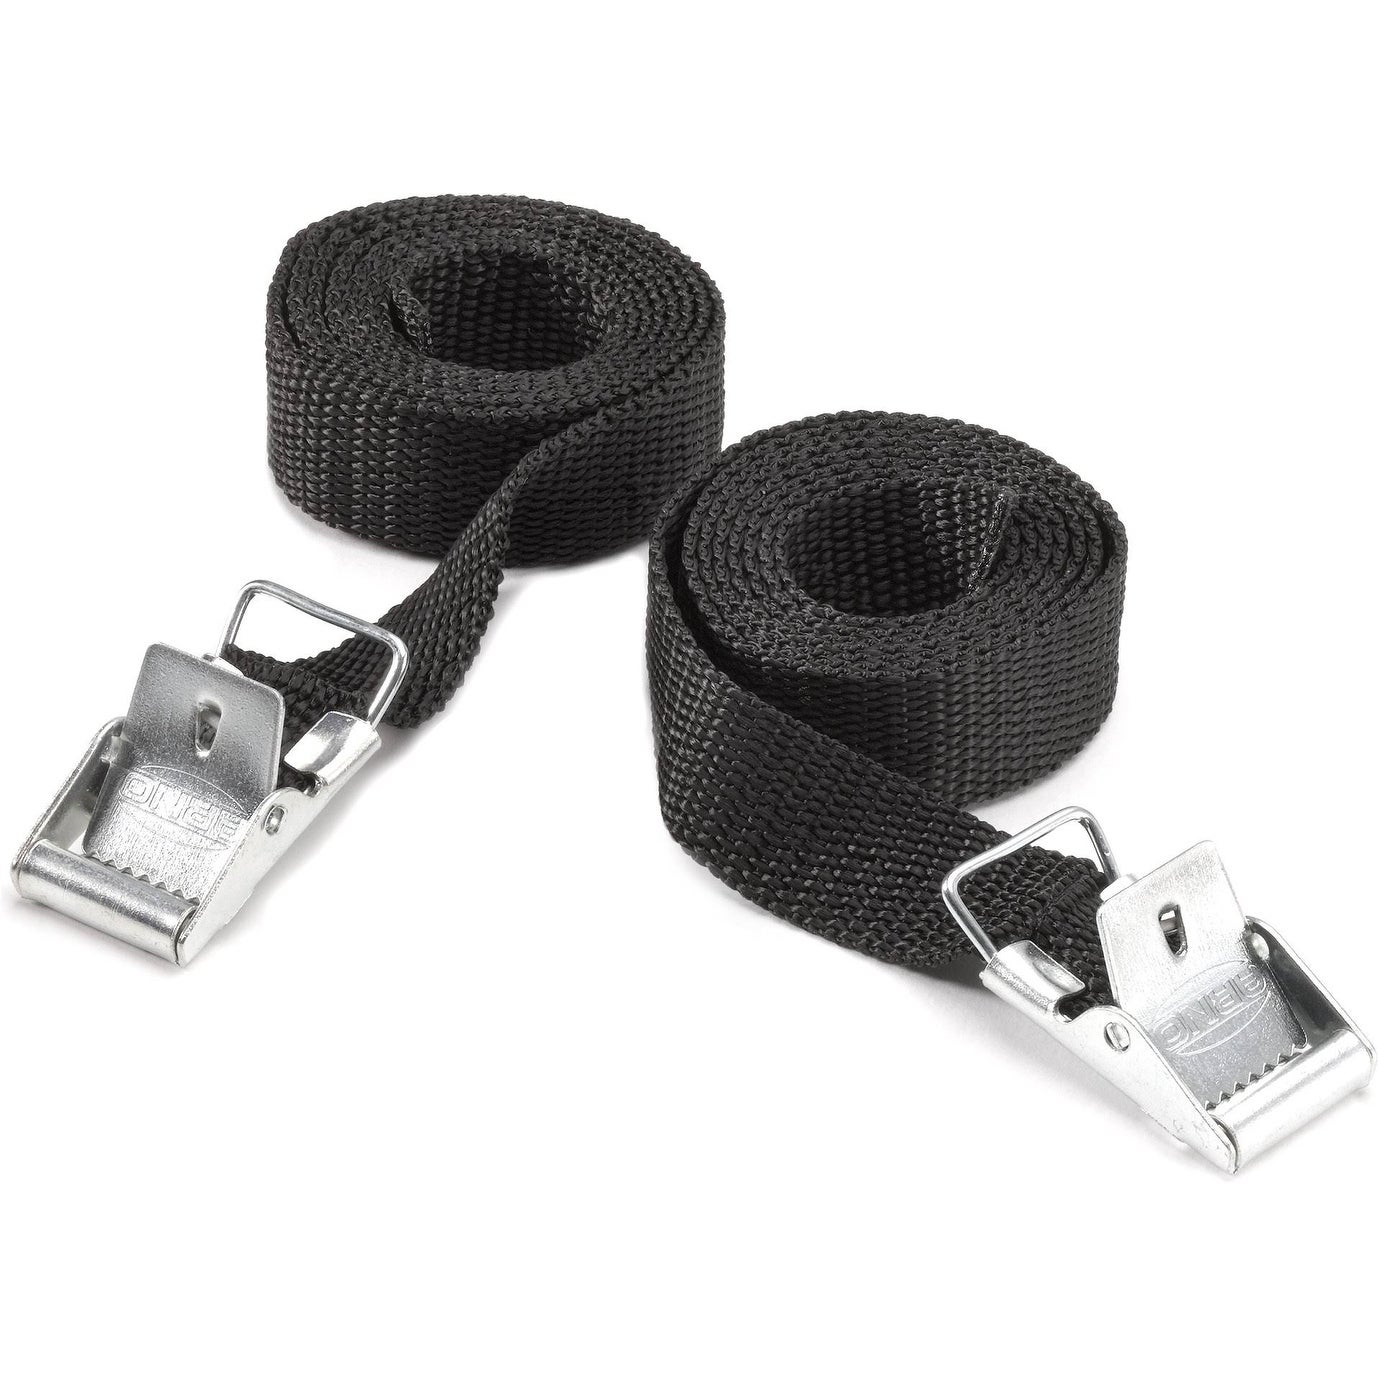 "6-Pack of 2 Coghlan/'s Arno Straps 60/"" Adjustable Non-Slip Suspenders w//Buckle"